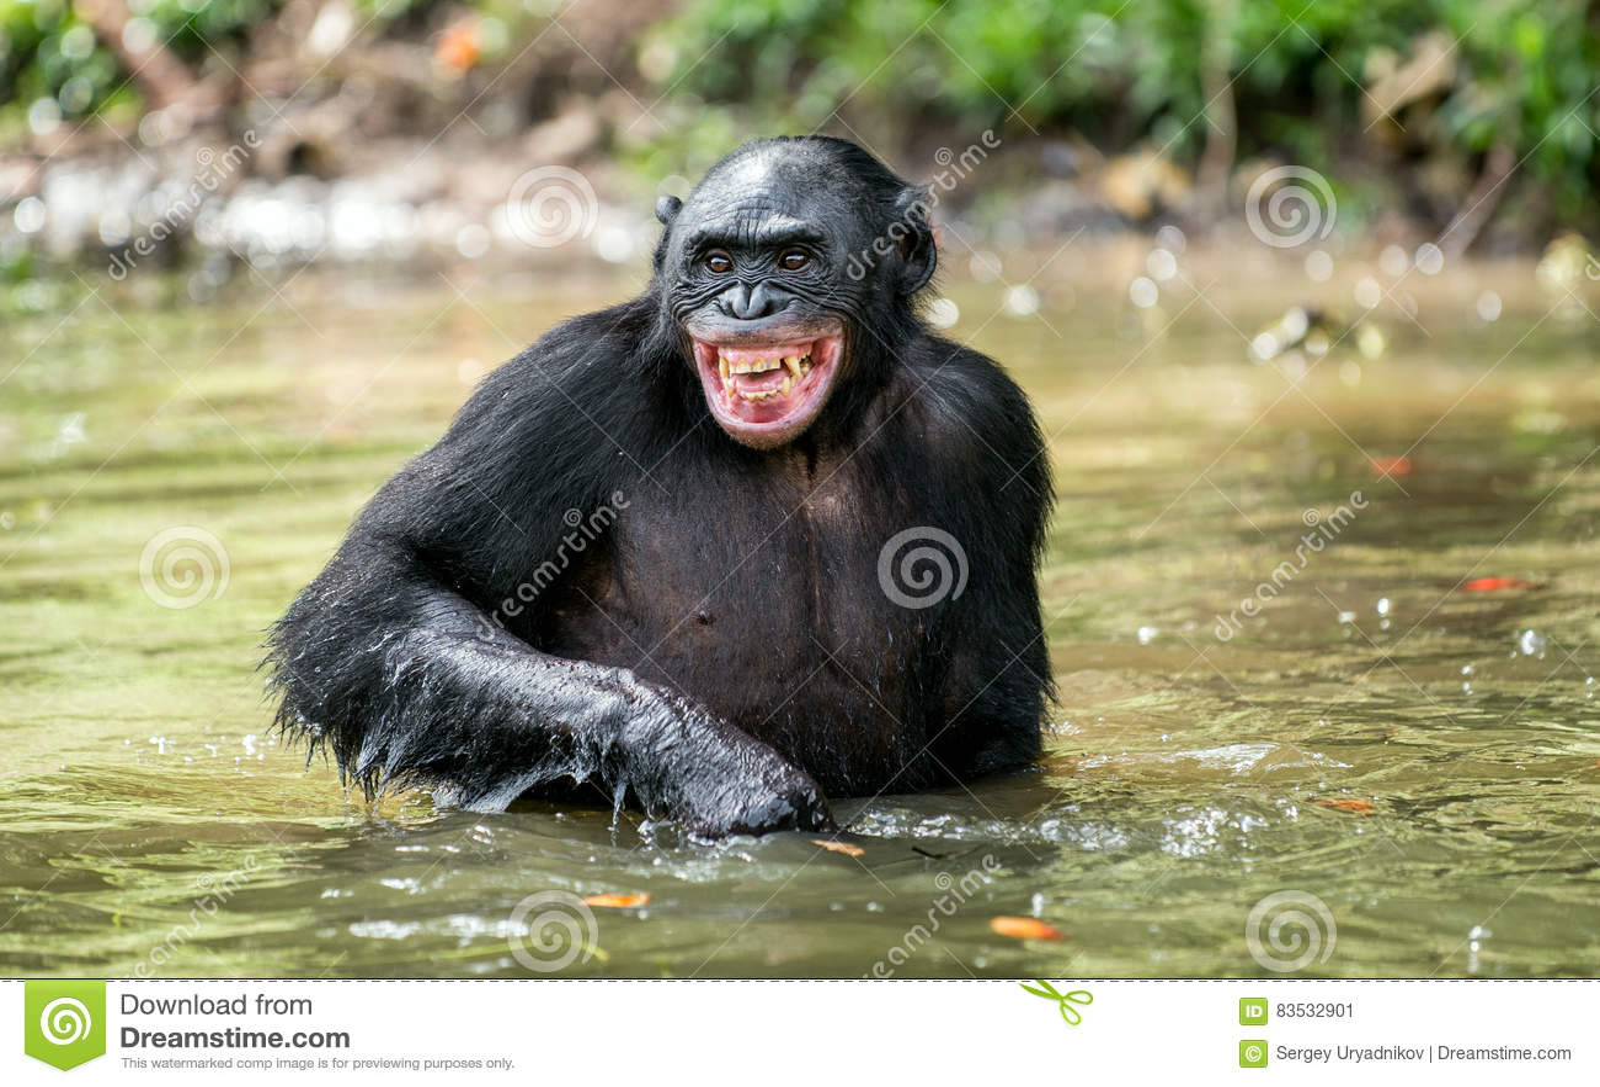 Smiling Chimpanzee Bonobo in the water